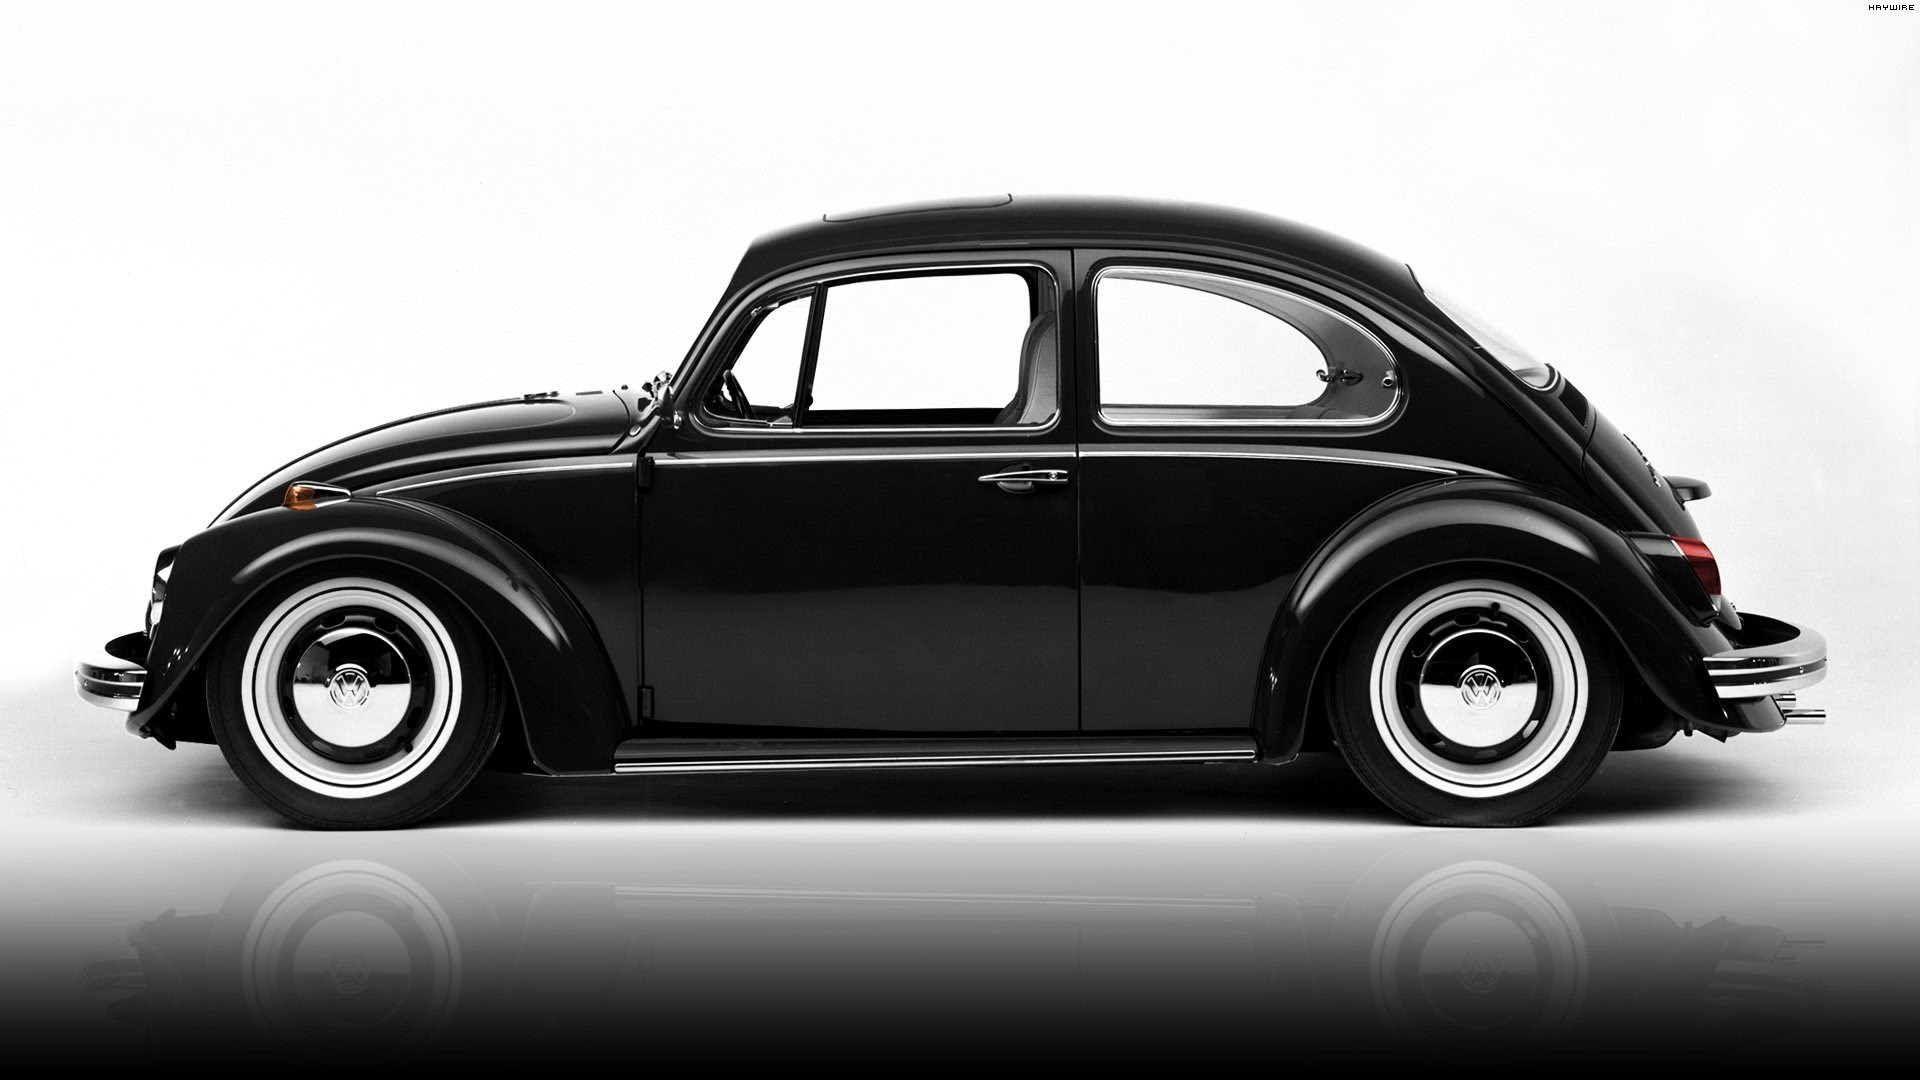 VW Beetle Wallpaper HD (72+ images)